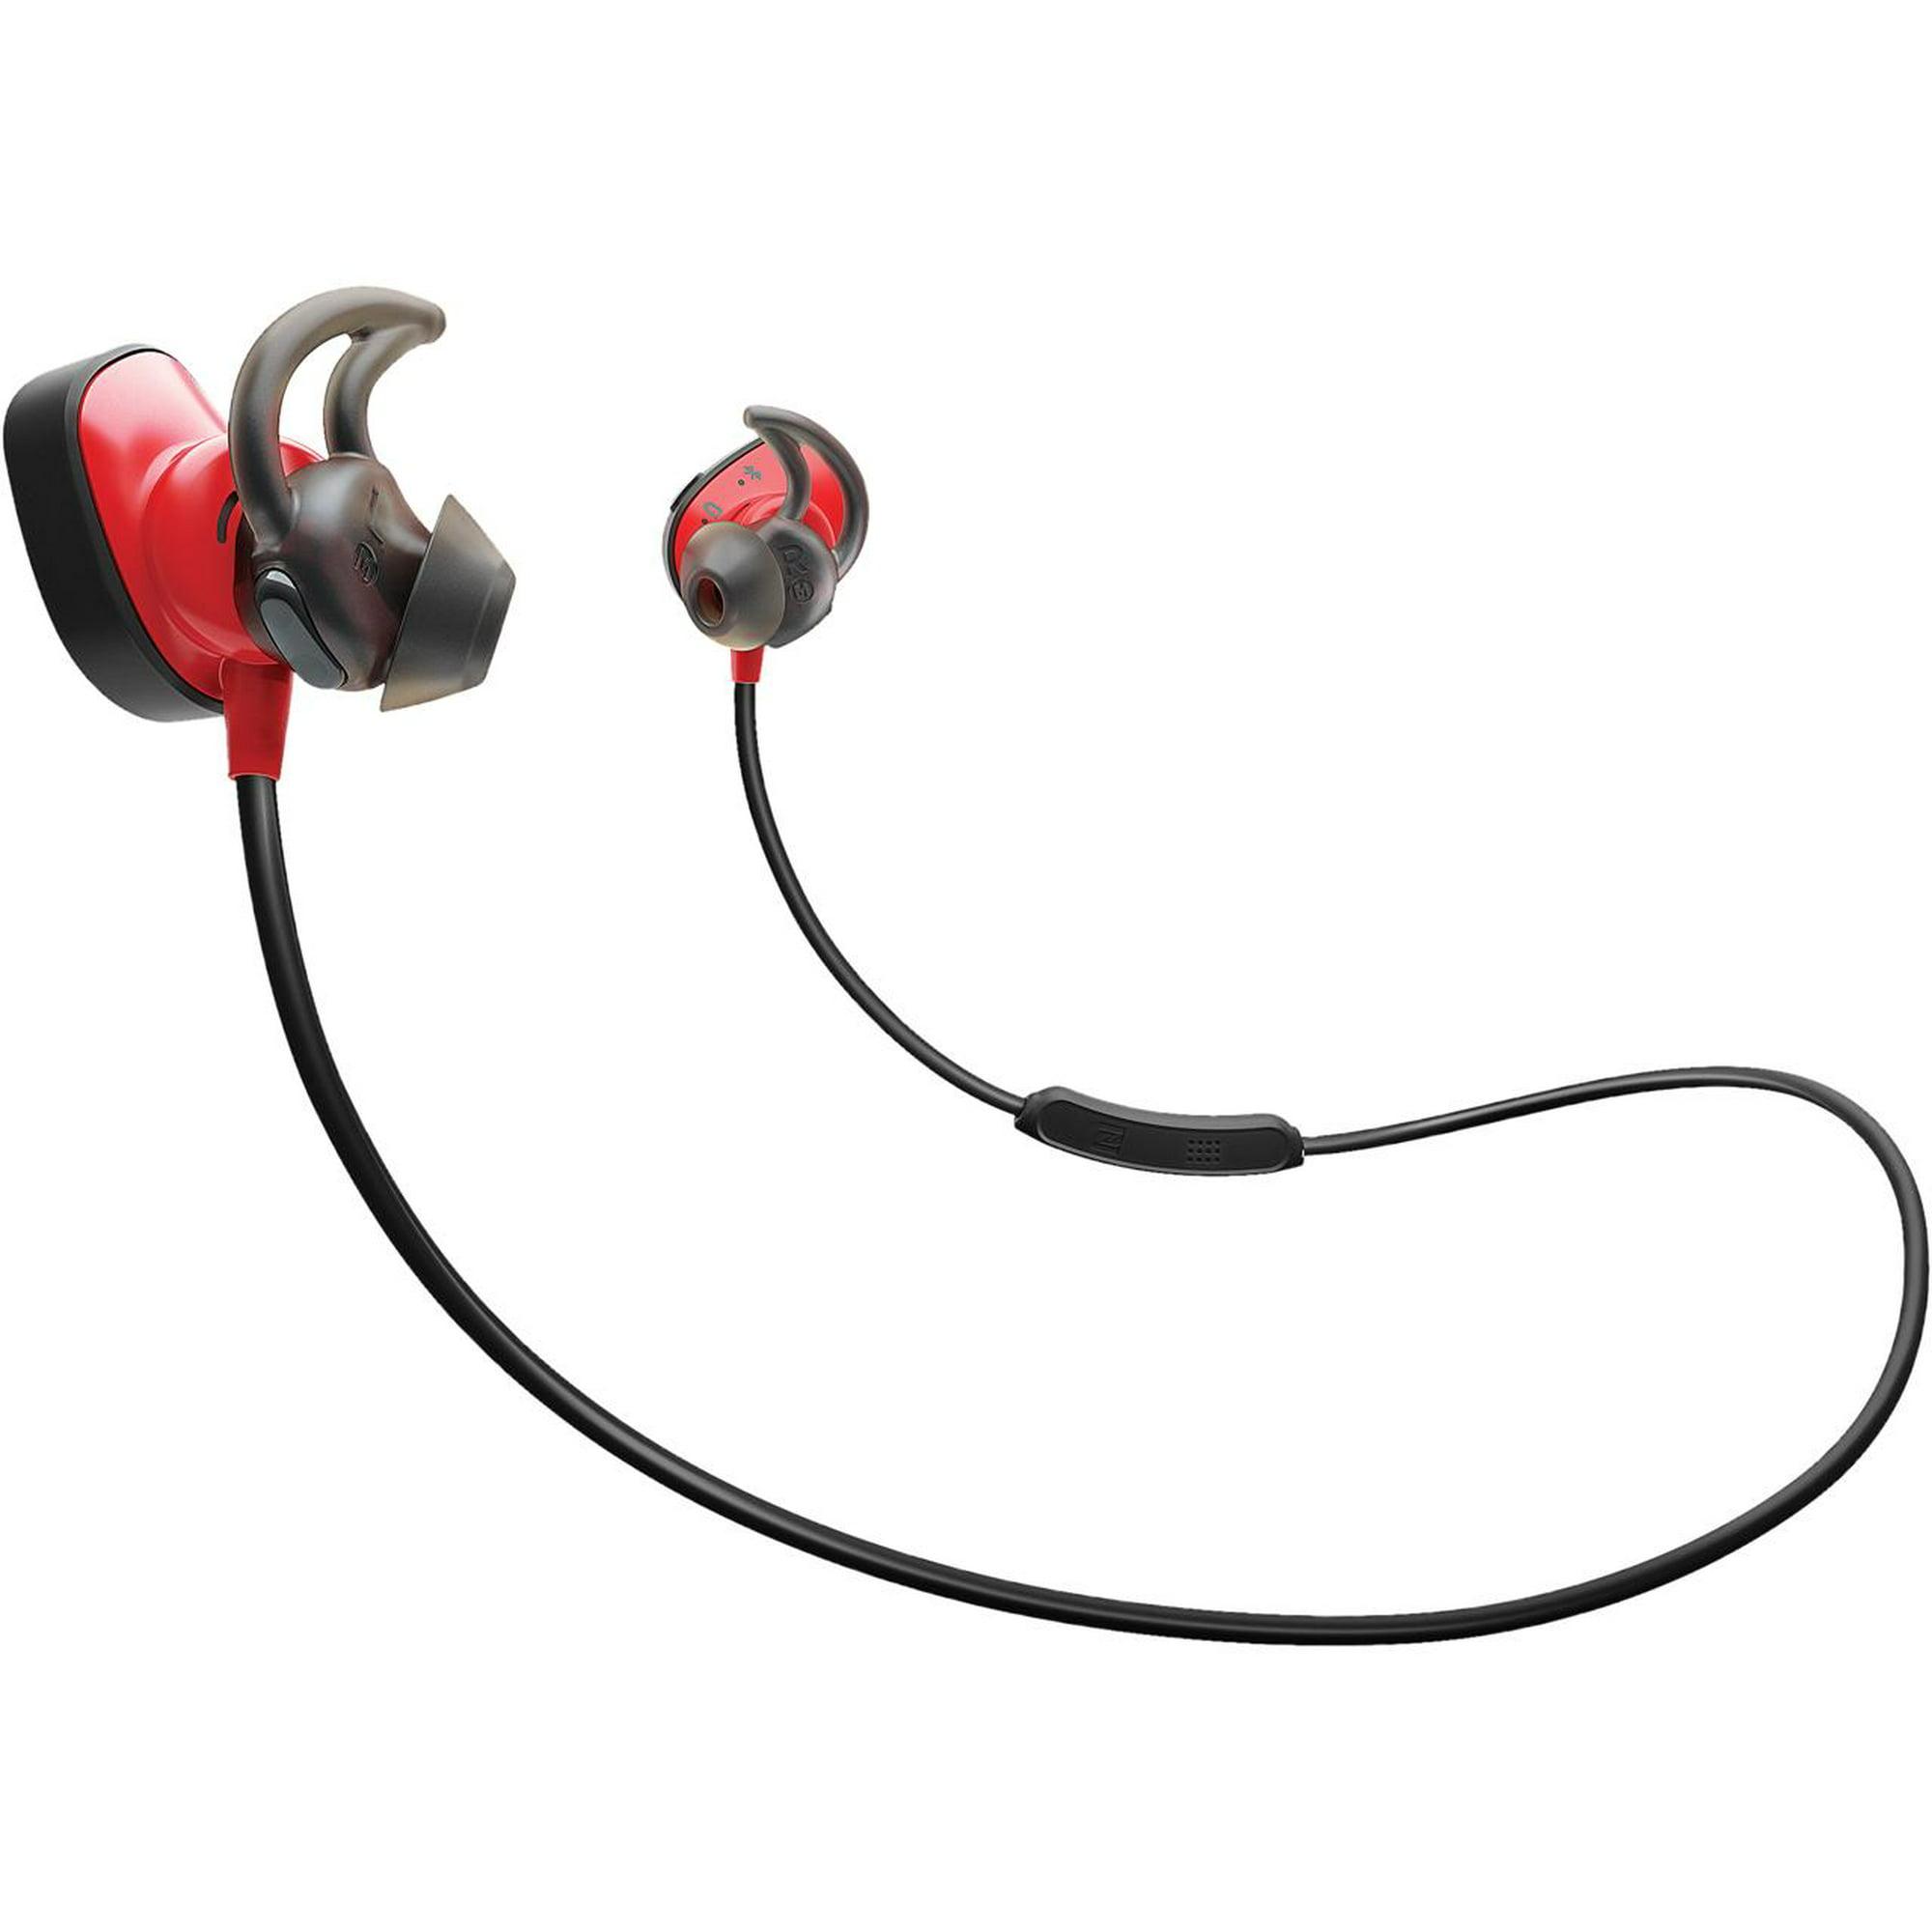 55c61c8d59c Buy Bose SoundSport Pulse Wireless Headphones | Cheapest bose deals ...